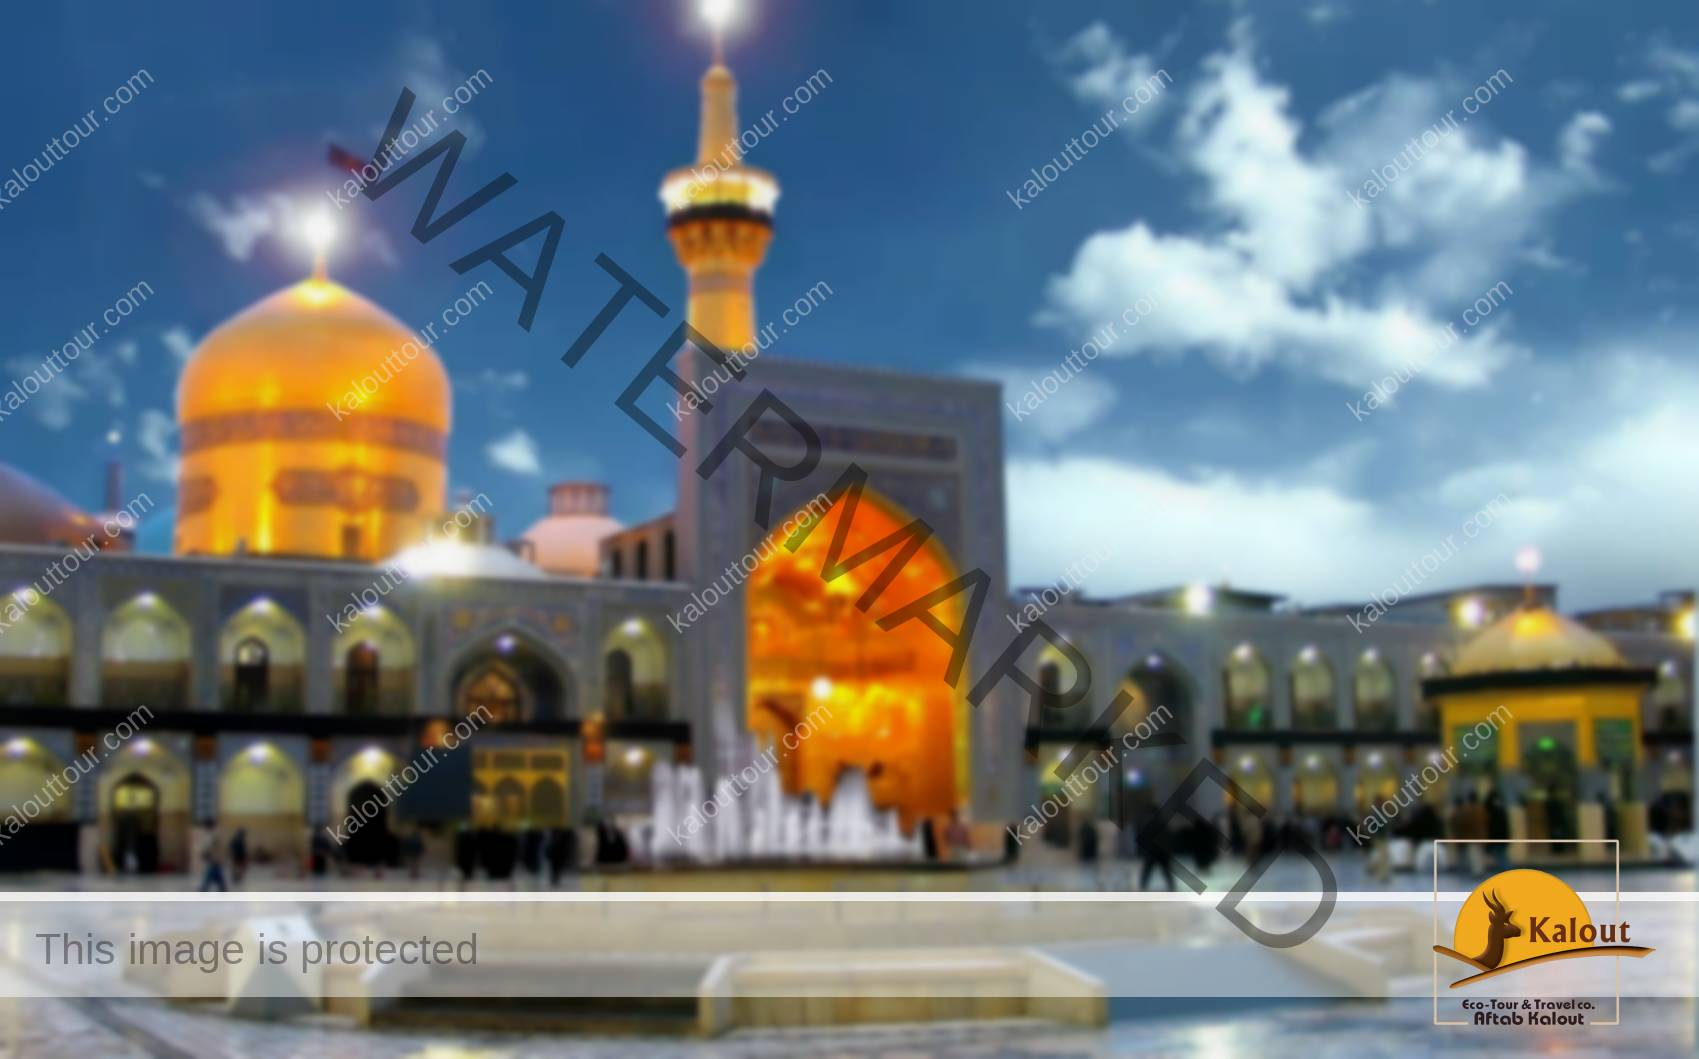 اعتکاف علمی نوروز مشهد بنر ثبت نام اعتکاف از مسجدنما.